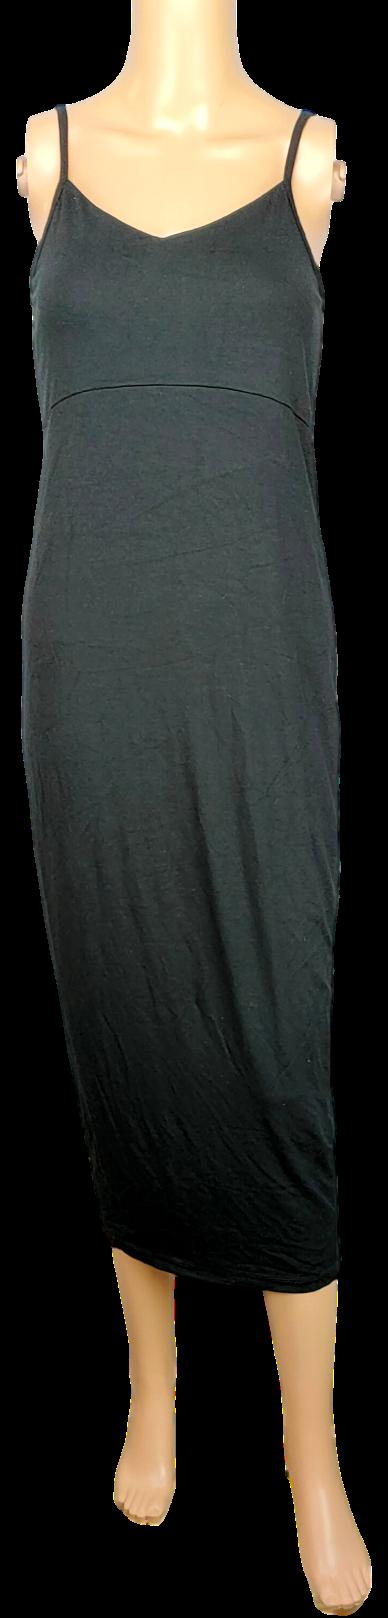 Robe ASOS -Taille 36